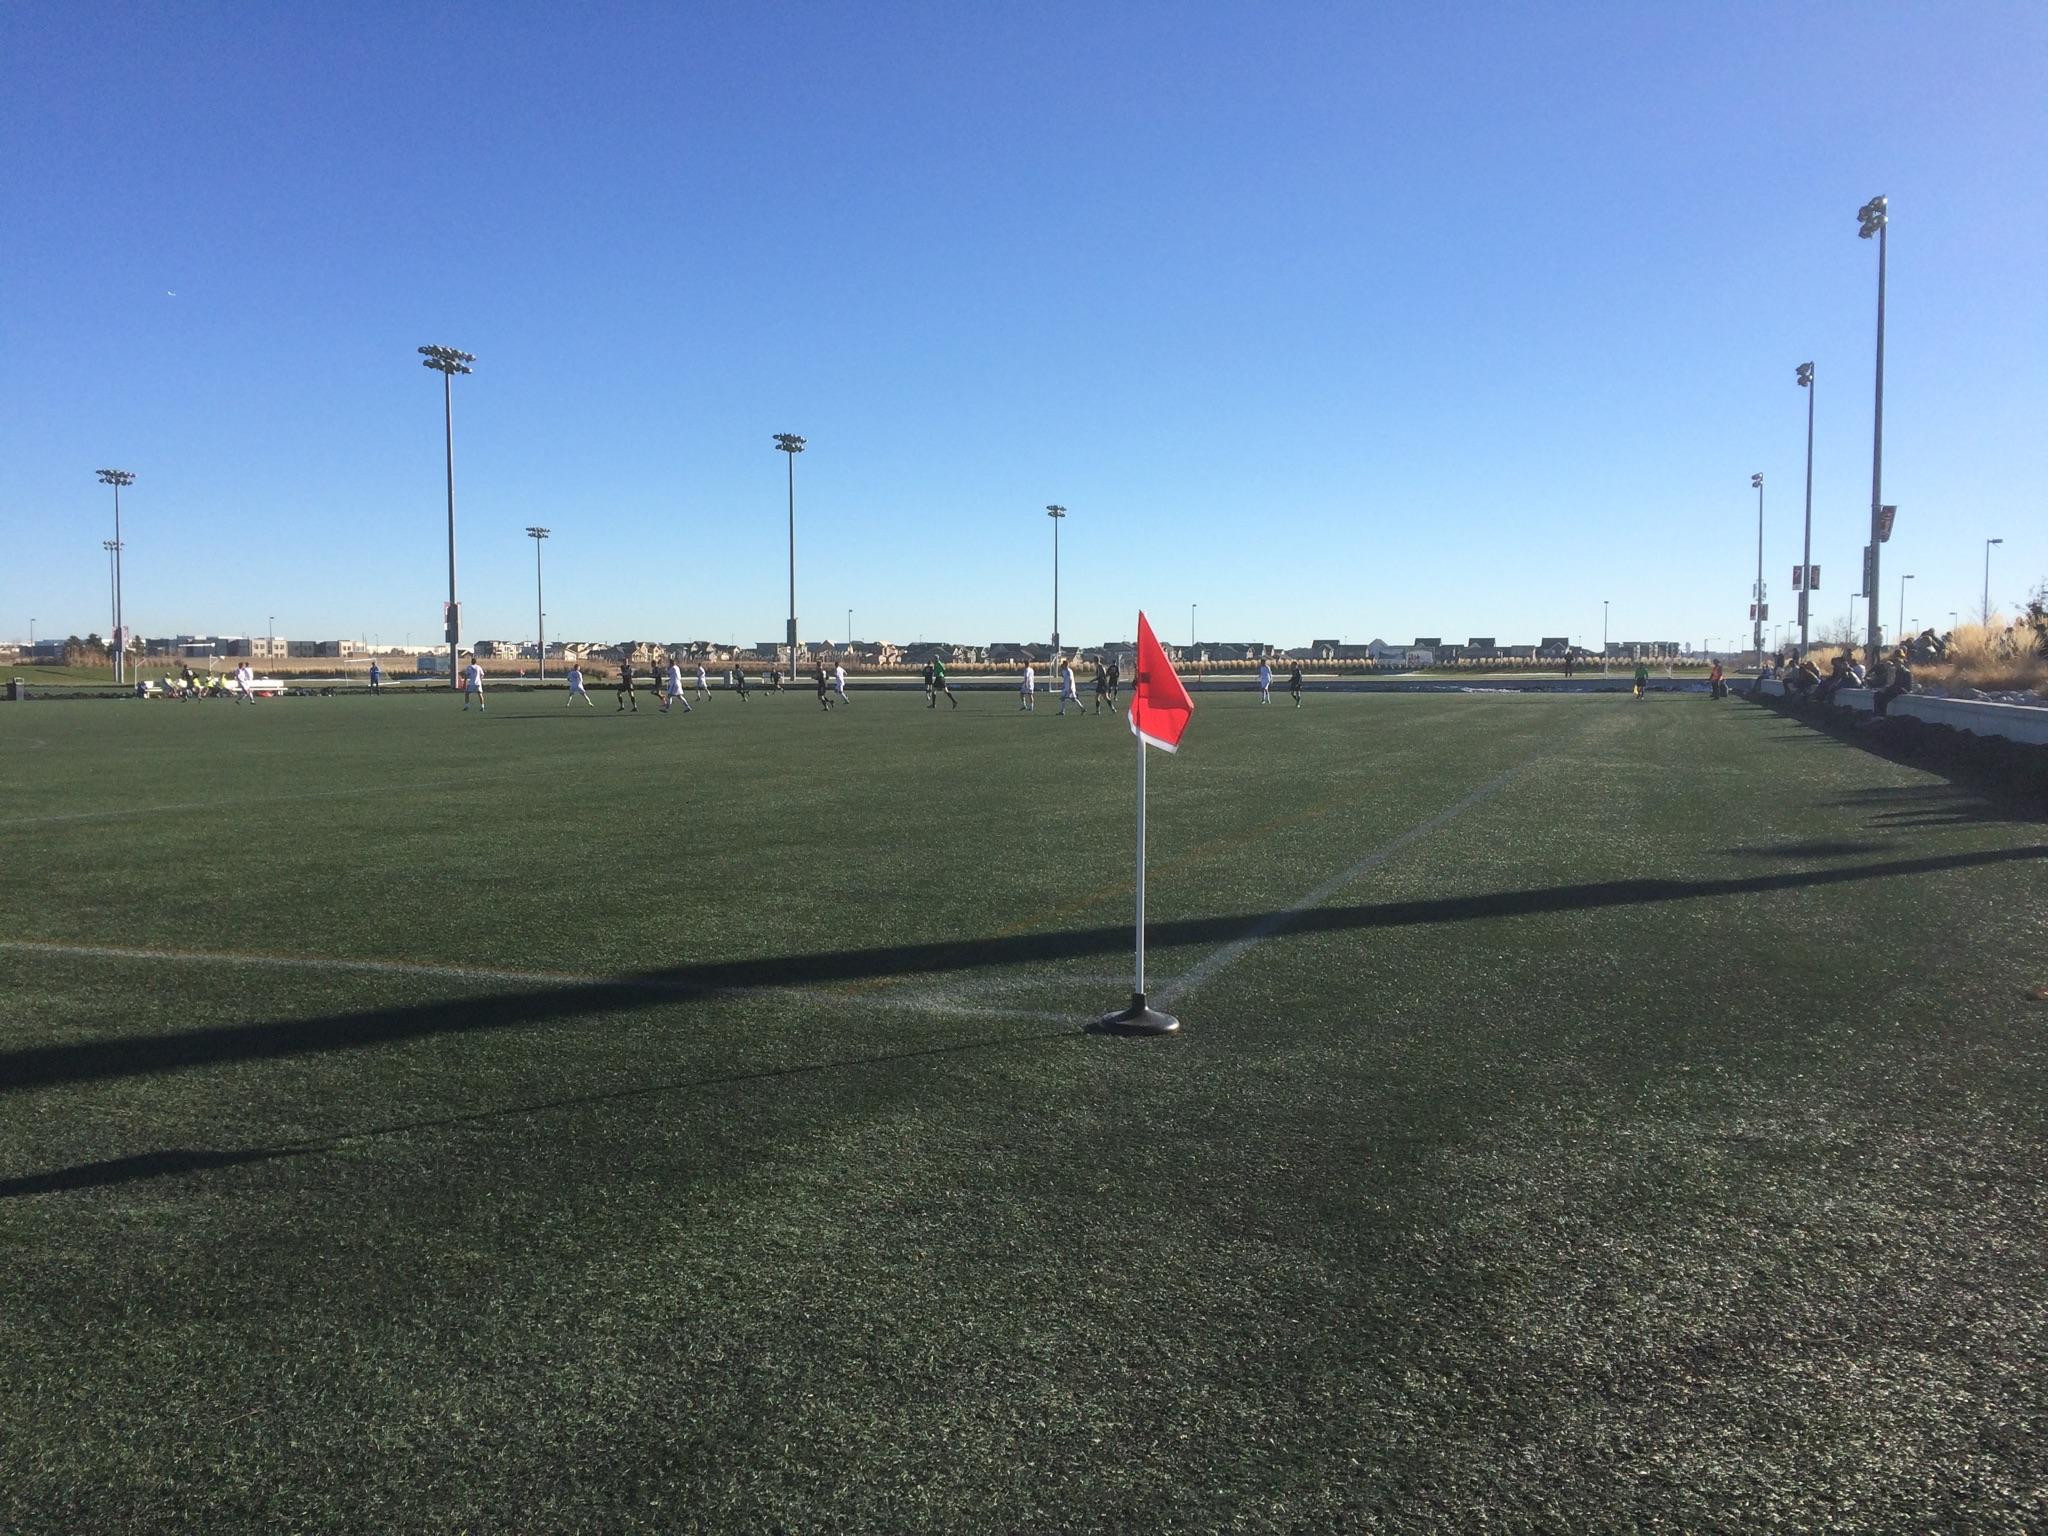 Harpos FC vs Colorado Rush in November at DSGP